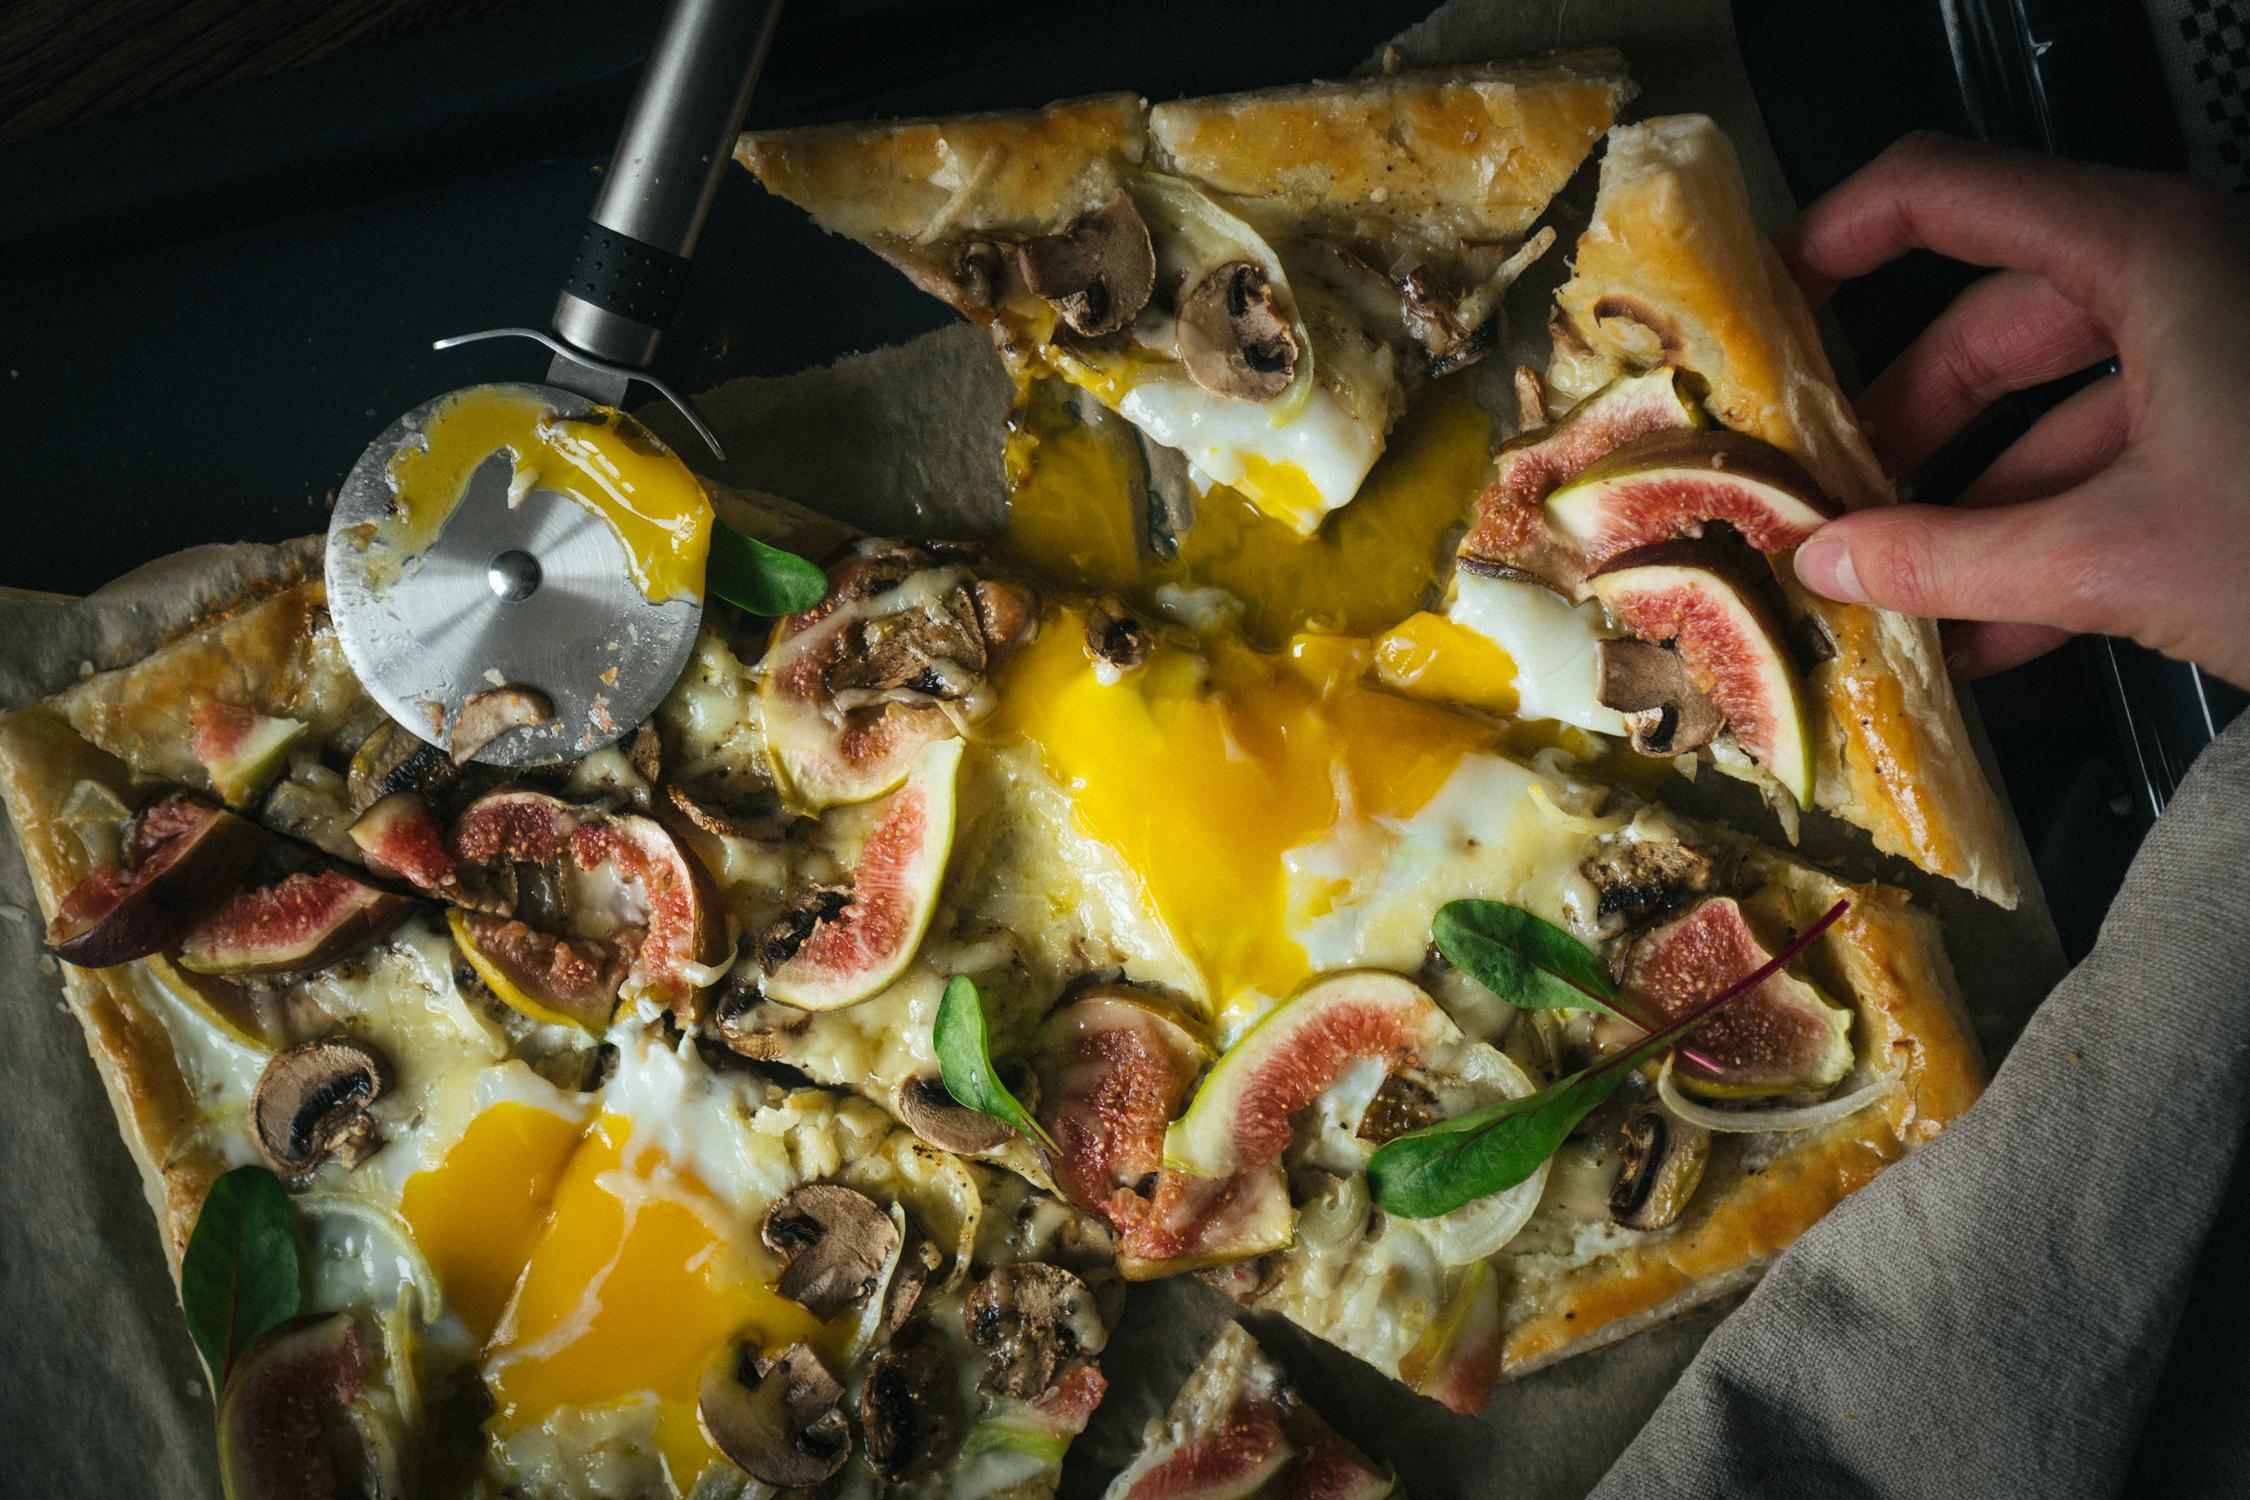 puff_pastry_eg_tart_with_gruyere_figs_and_mushrooms-5.jpg